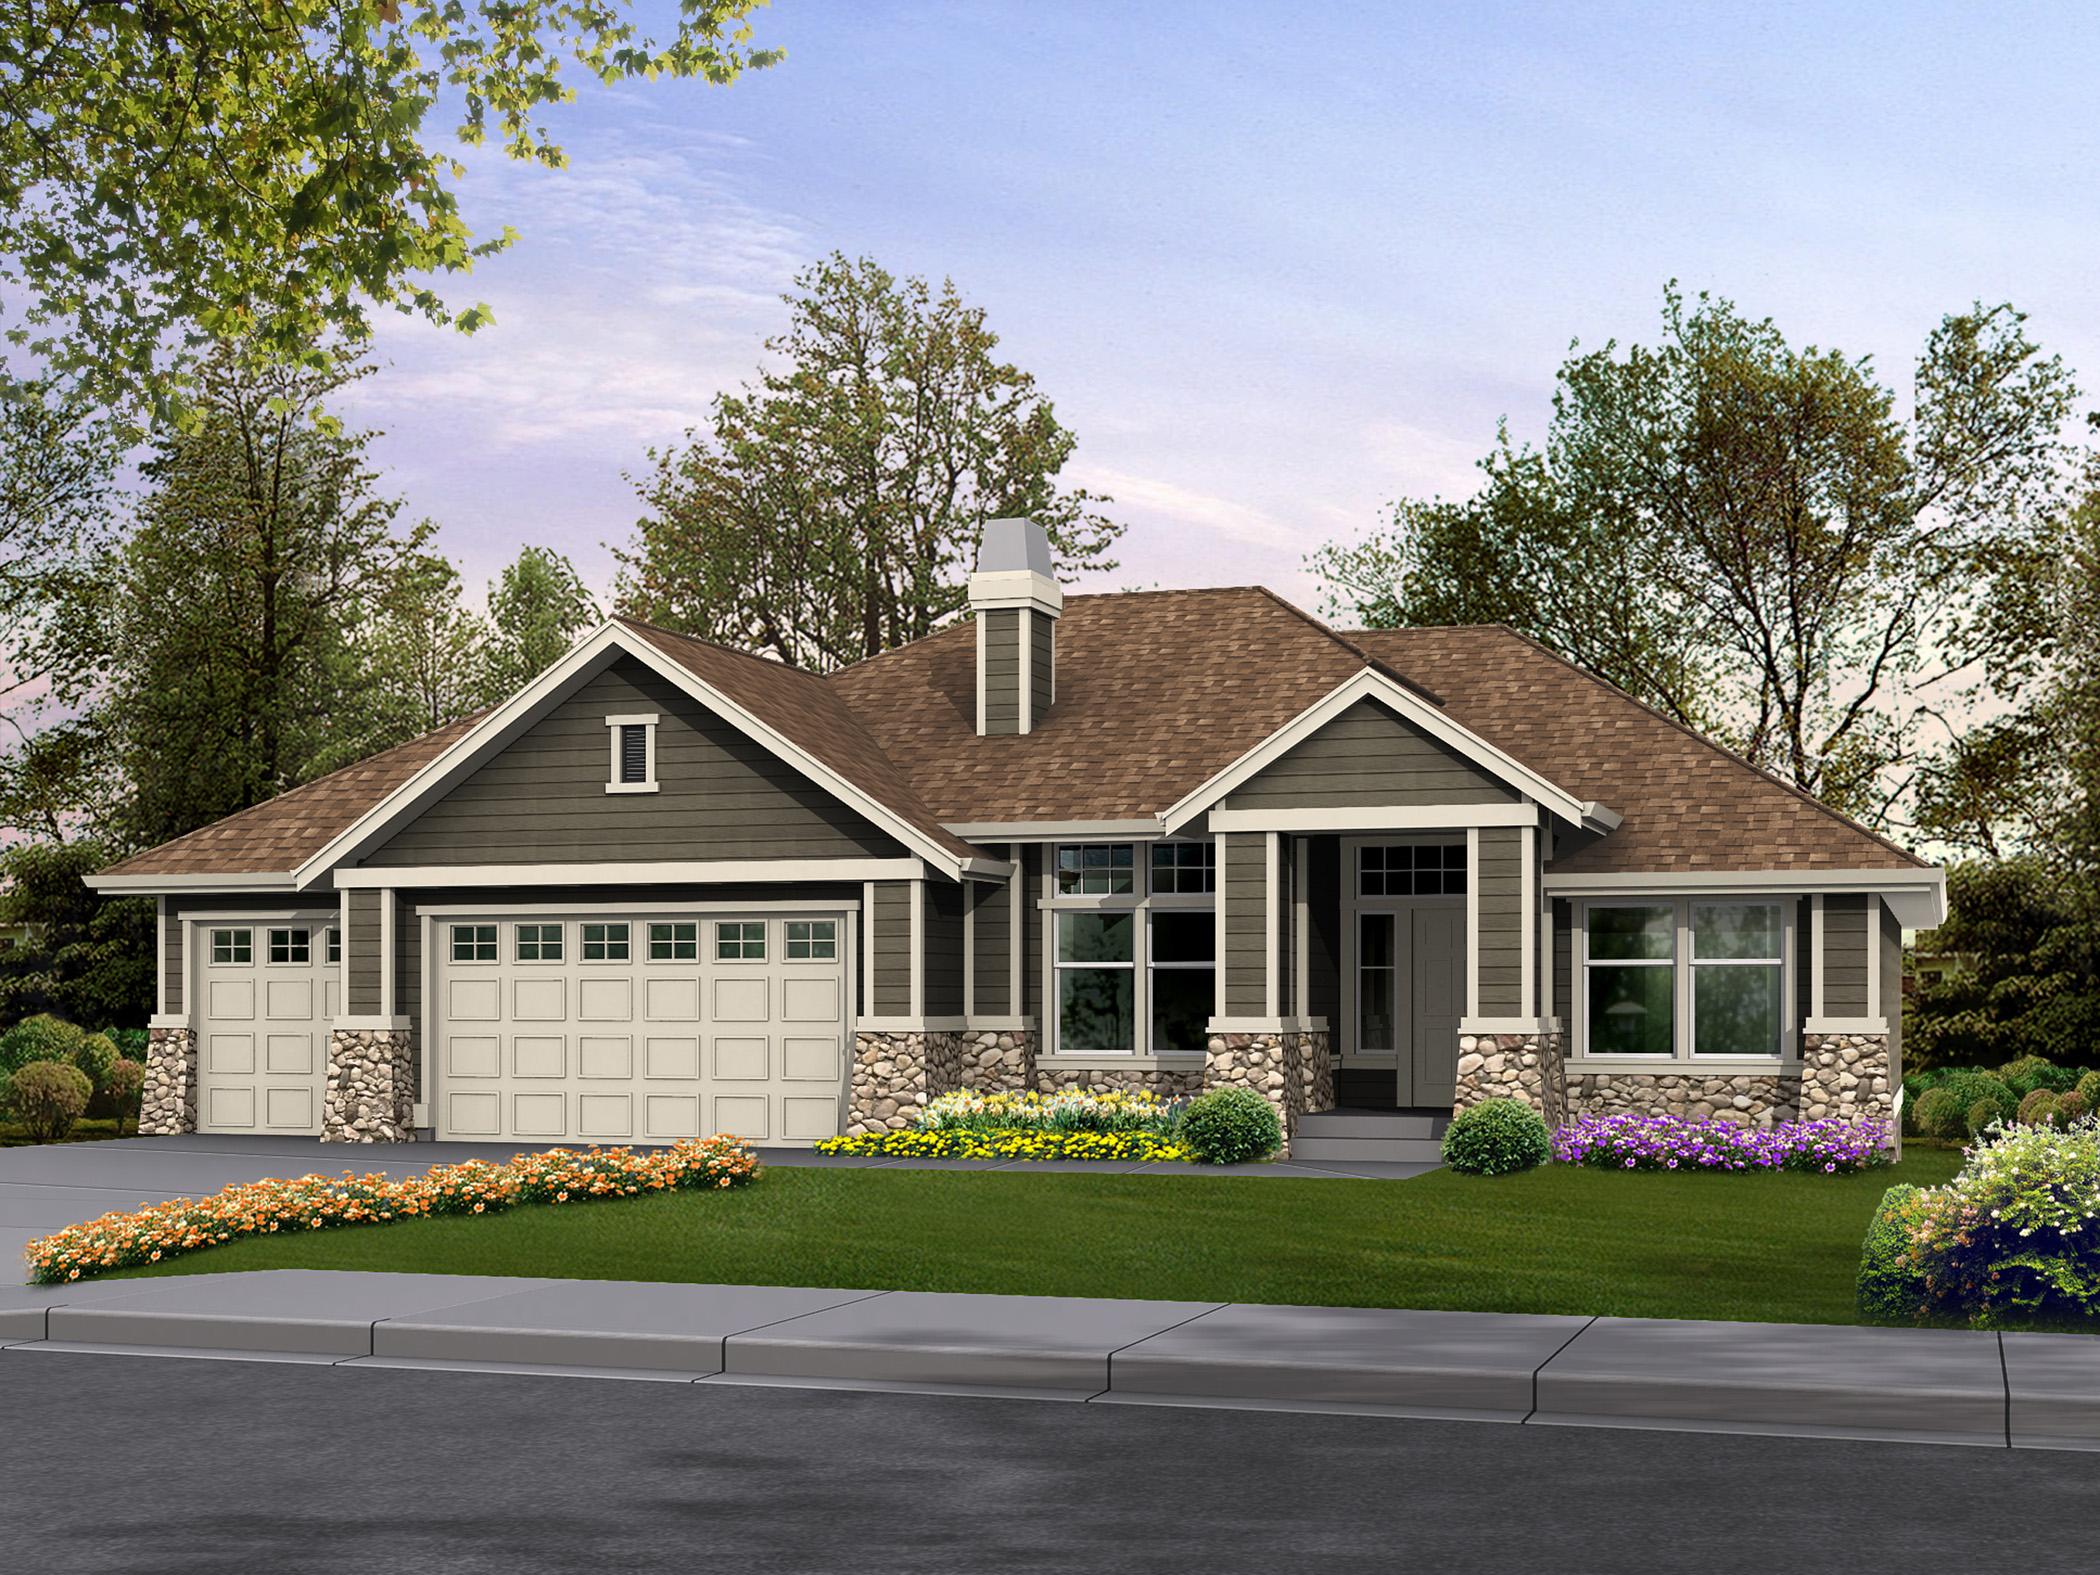 23234jd_1479211255 Ramblers Sq Ft House Design on